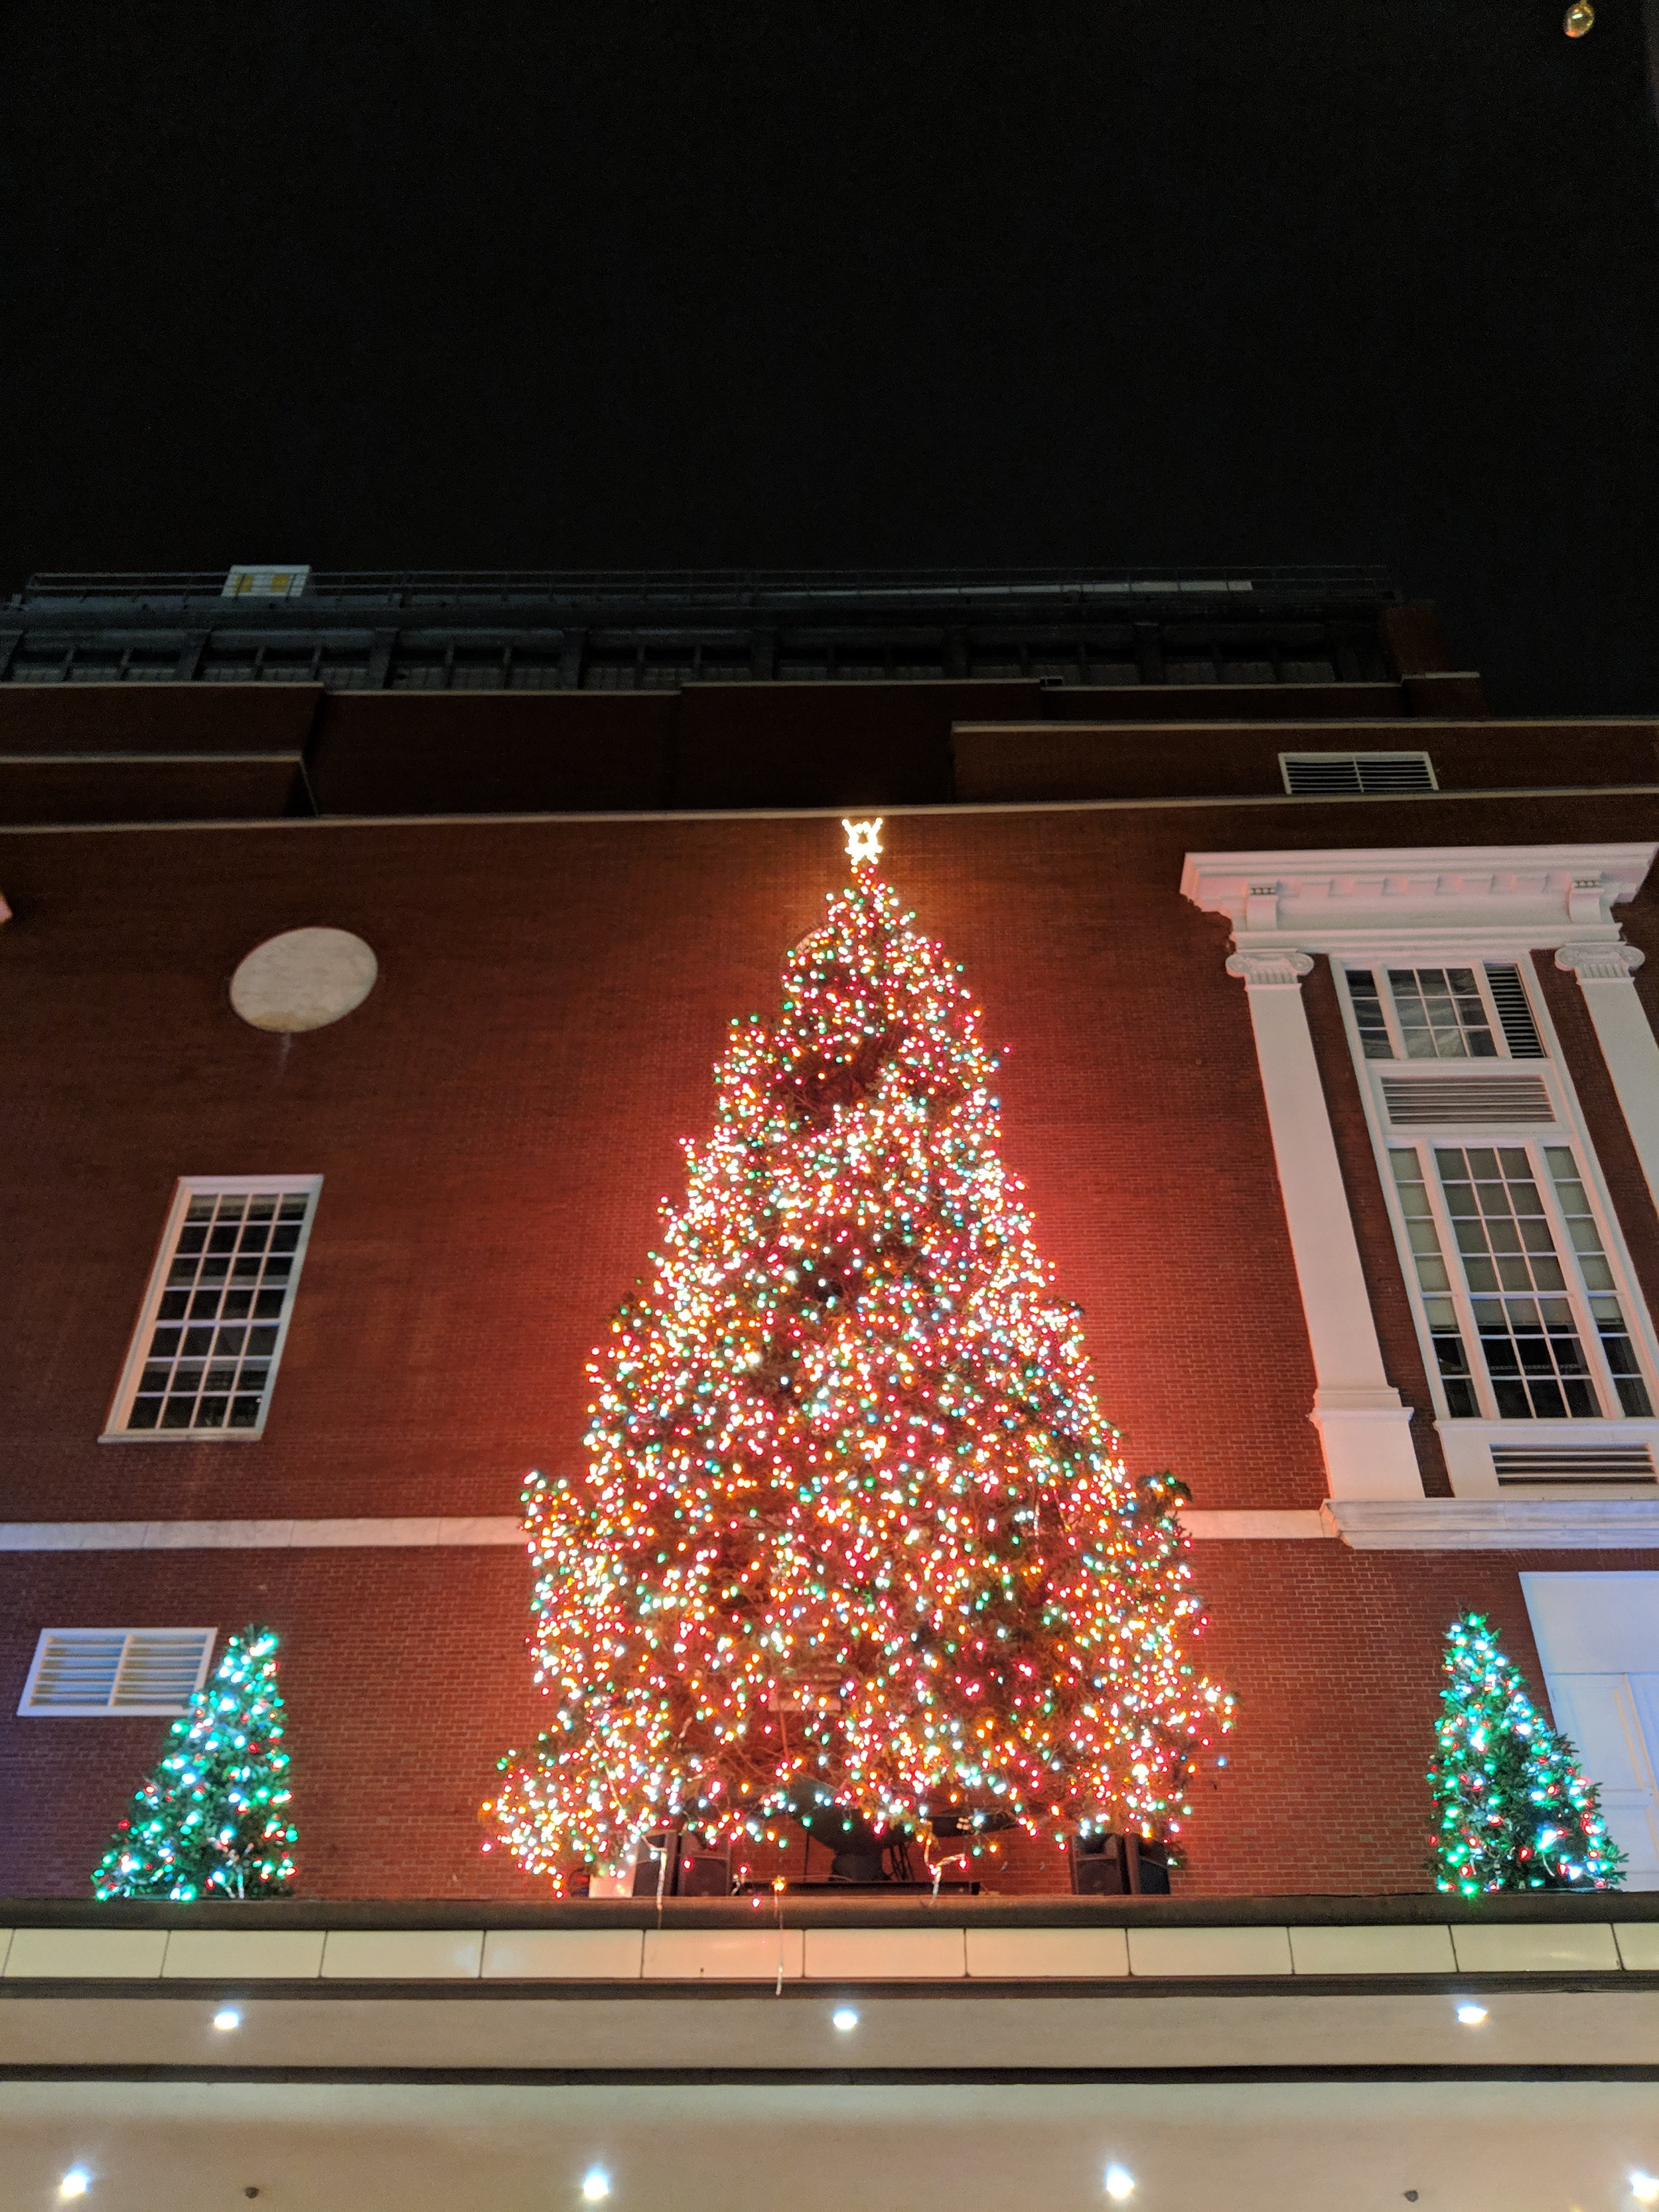 bri rinehart; photography; boston; Christmas; lights